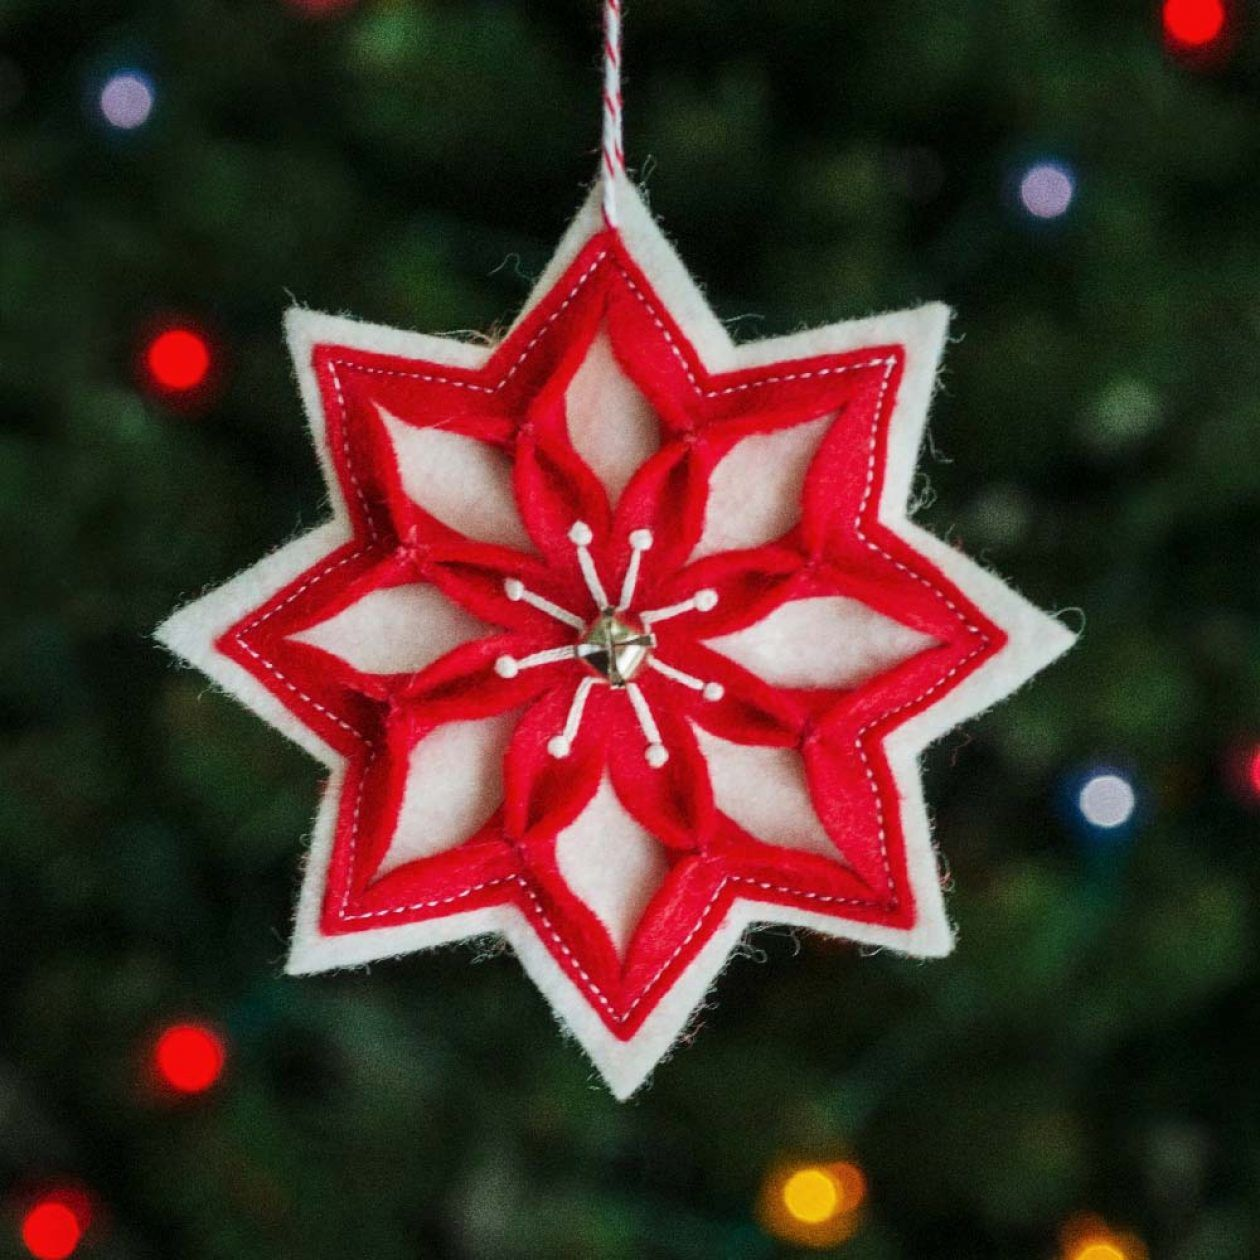 Snow Star Ornament Pattern Betz White Ornament Tutorial Star Ornament Felt Ornaments